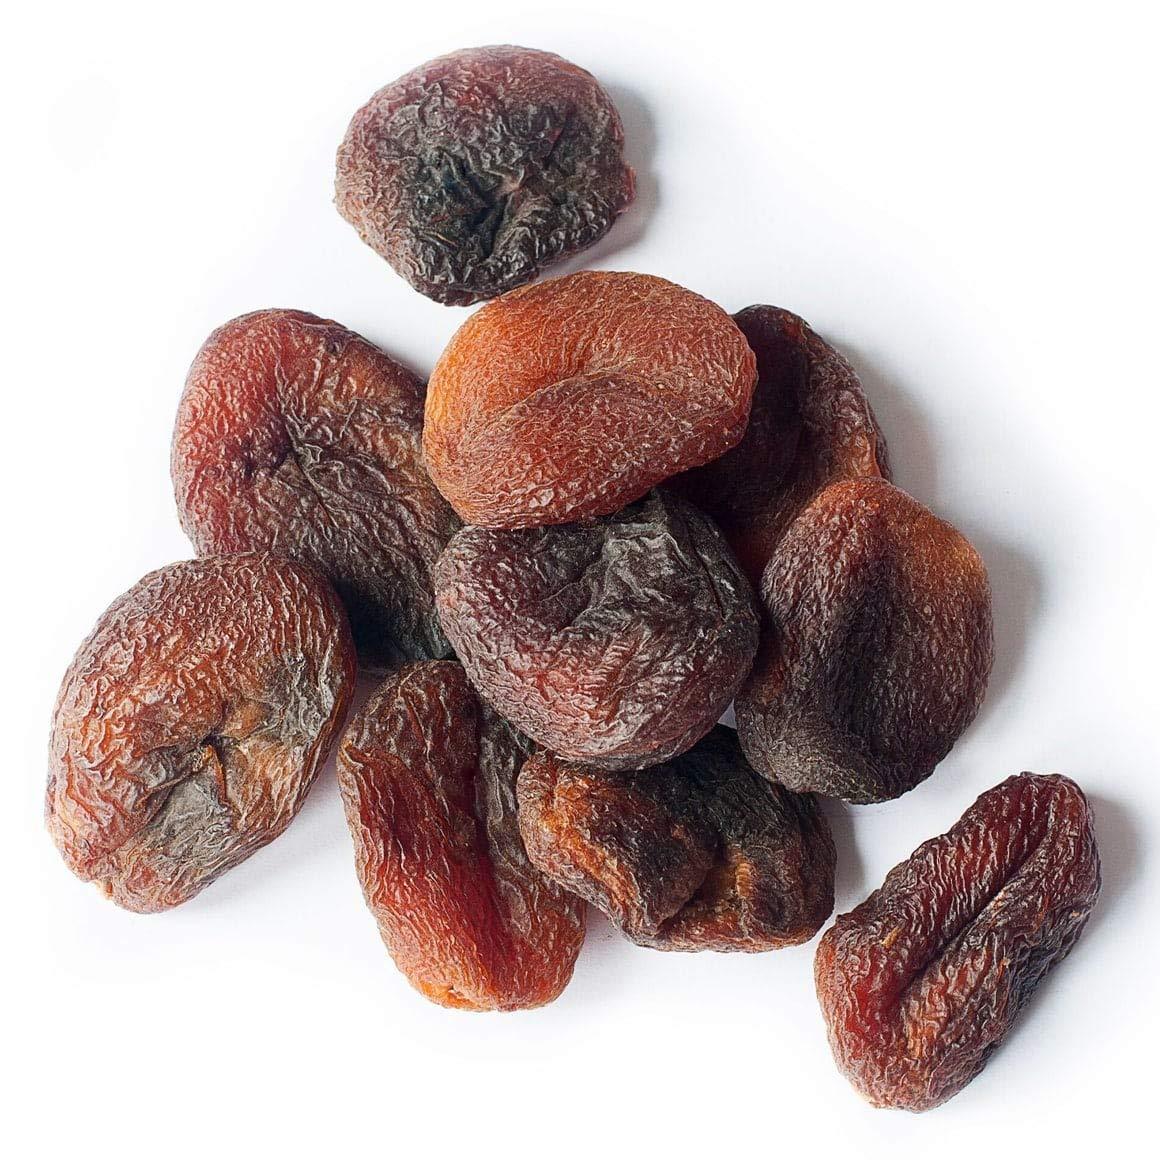 Organic Dried Apricots, 28 Pounds - Non-GMO, Kosher, Unsulfured, Raw, Vegan, Bulk